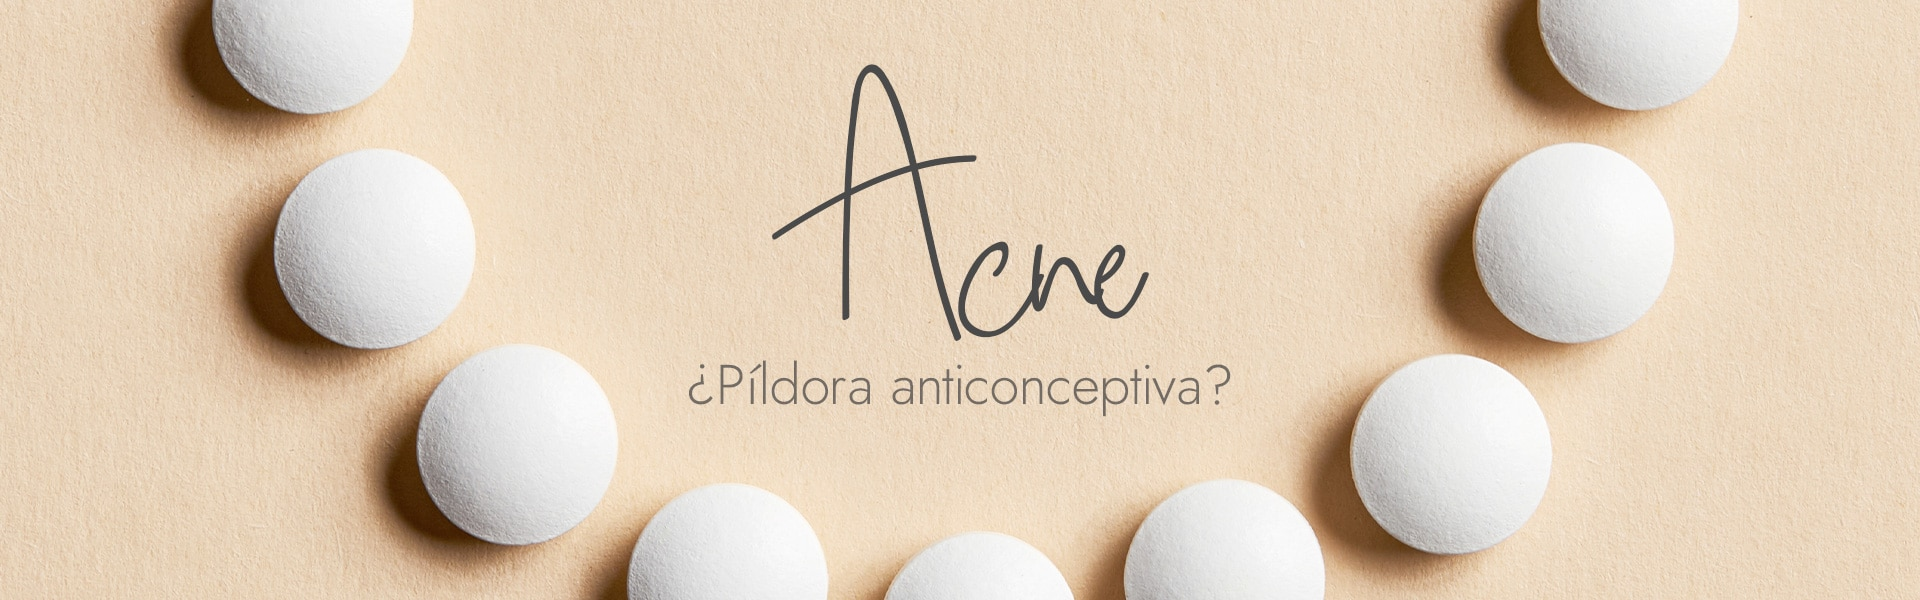 Píldora anticonceptiva para el acné